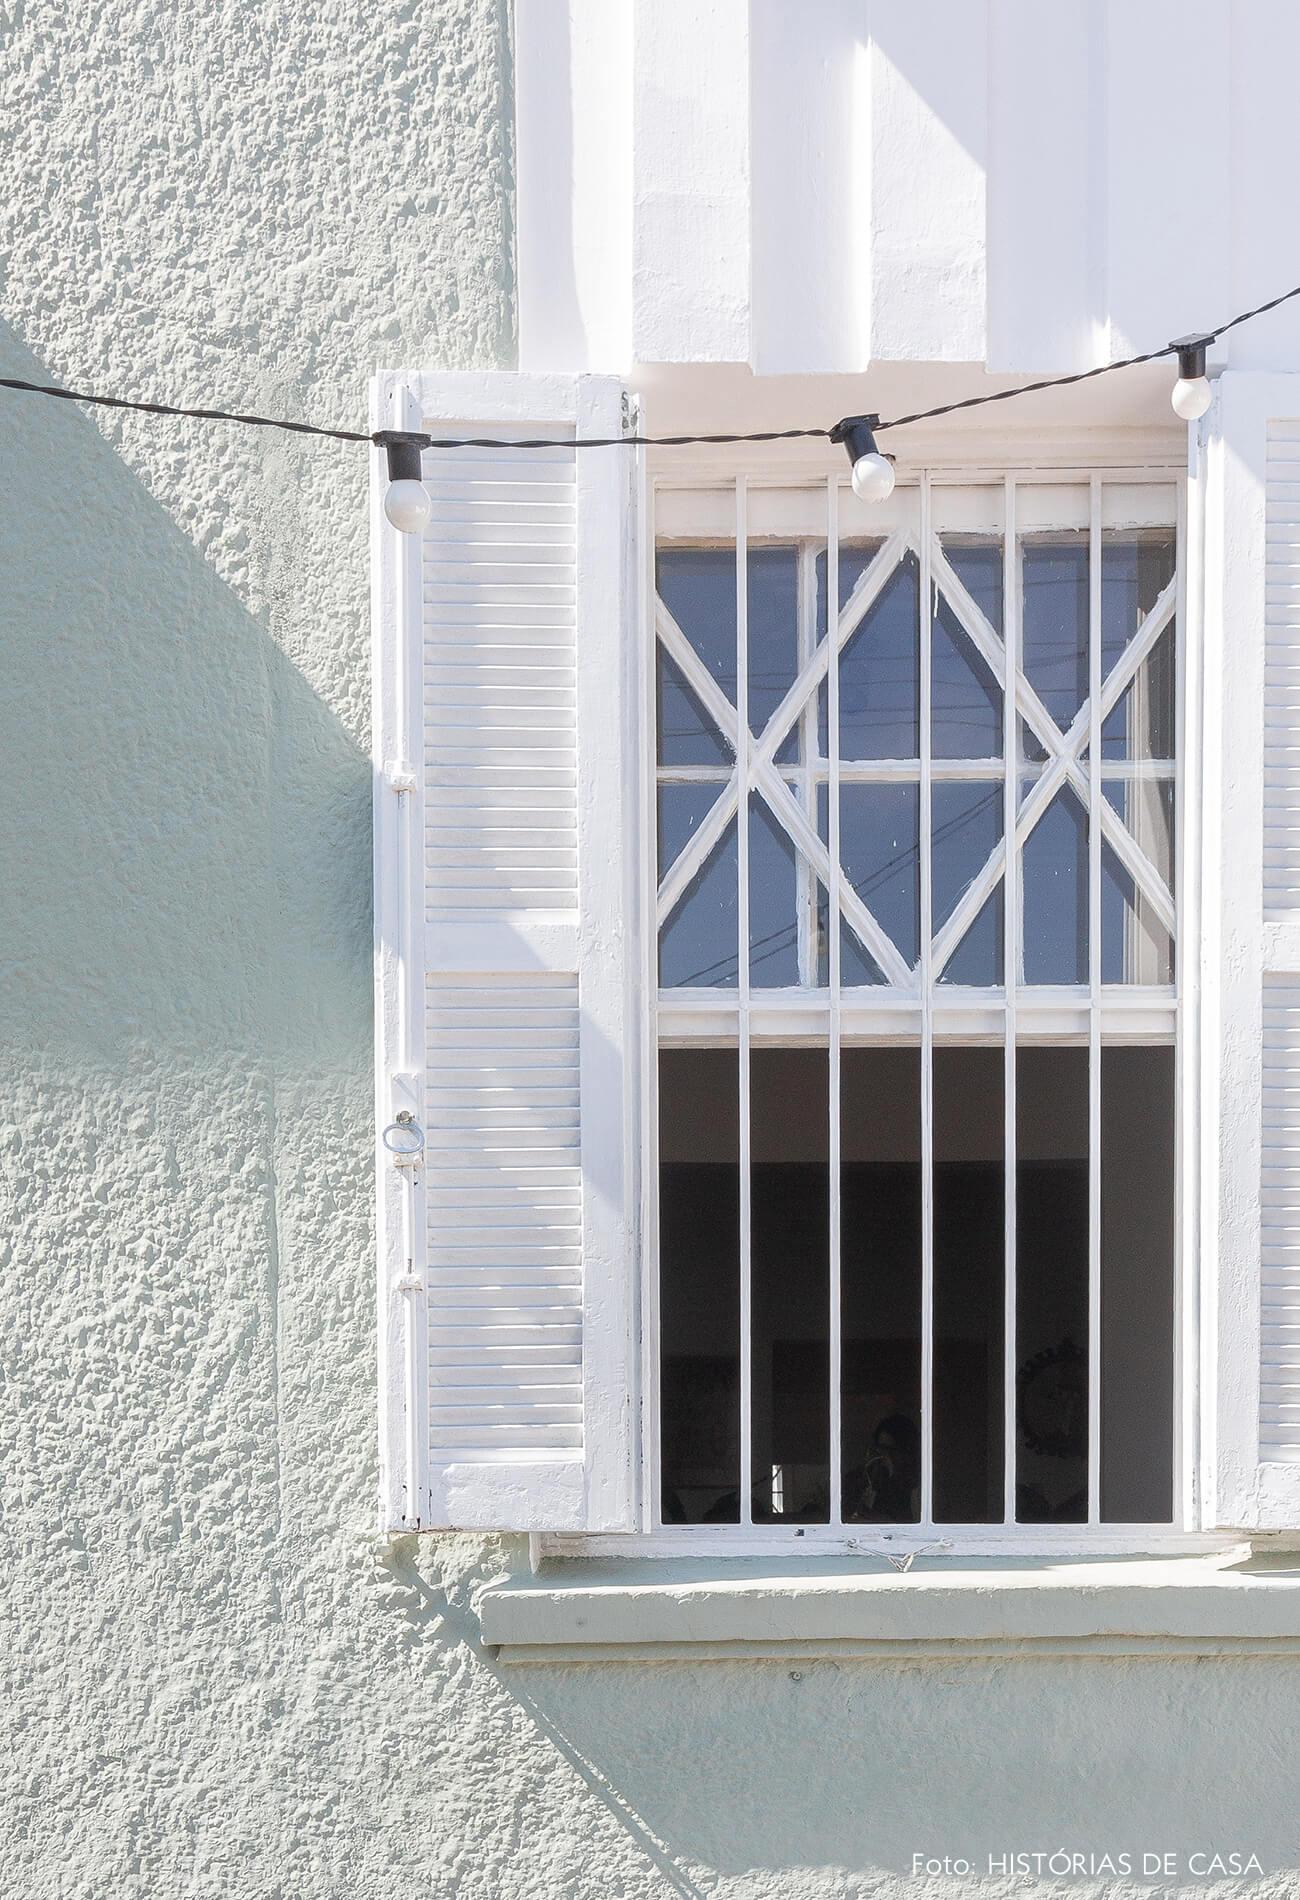 Casa de vila com janela antiga pintada de branco